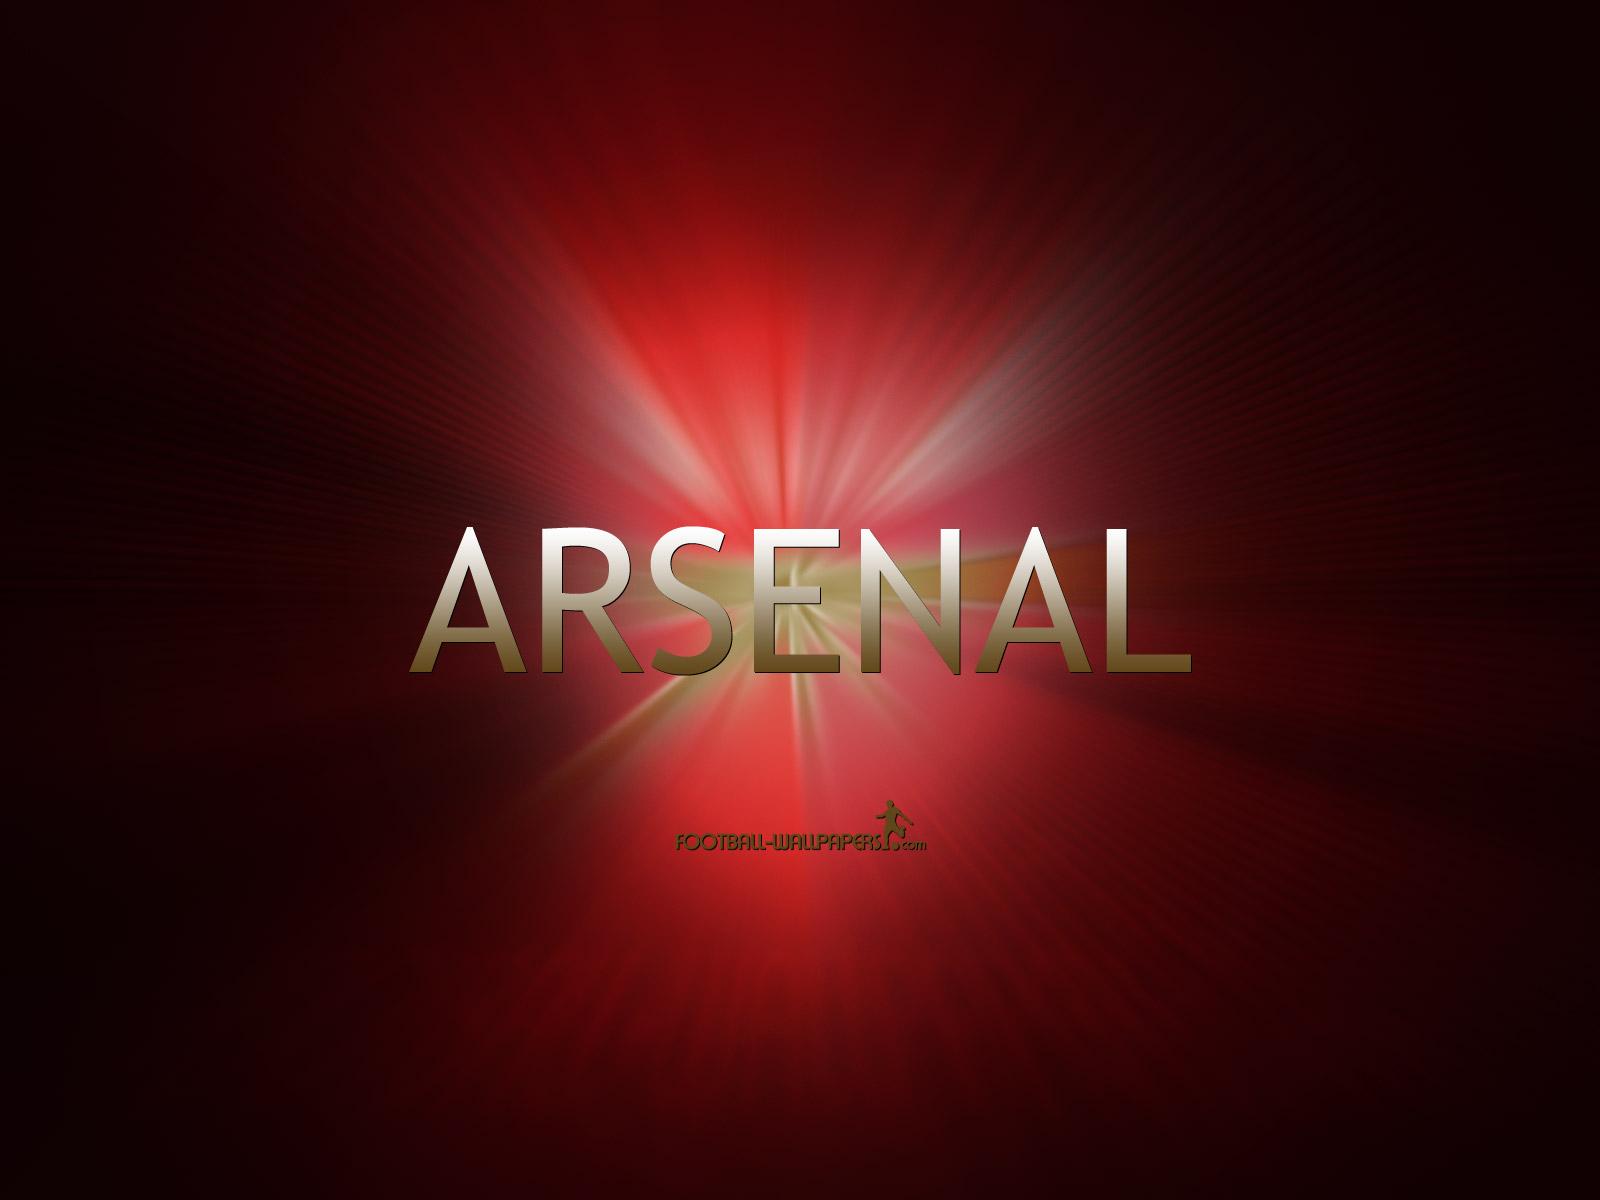 Enjoy this new Arsenal desktop background Arsenal wallpapers 1600x1200